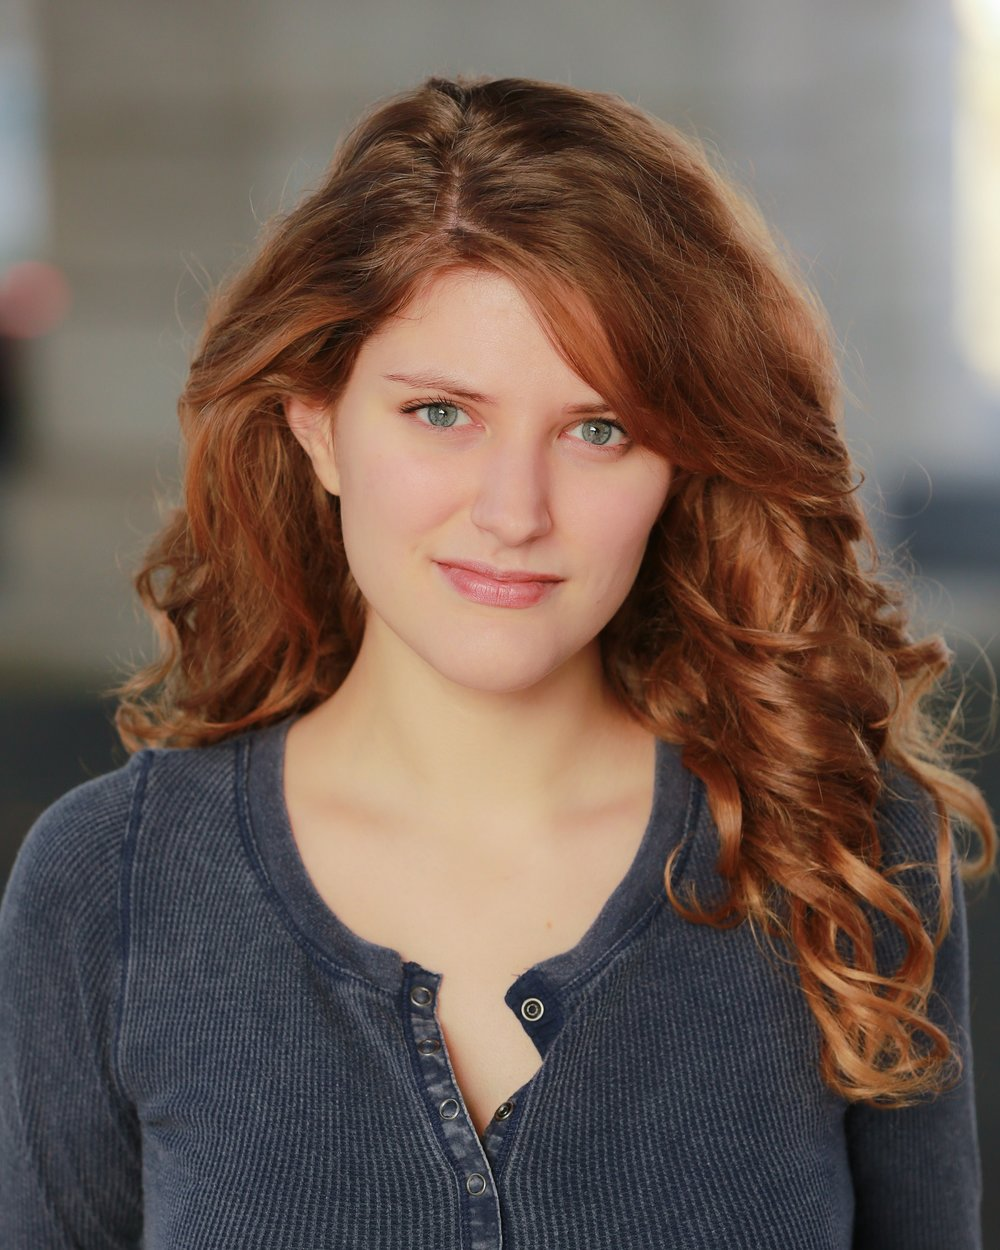 Jessica Hillenbrand